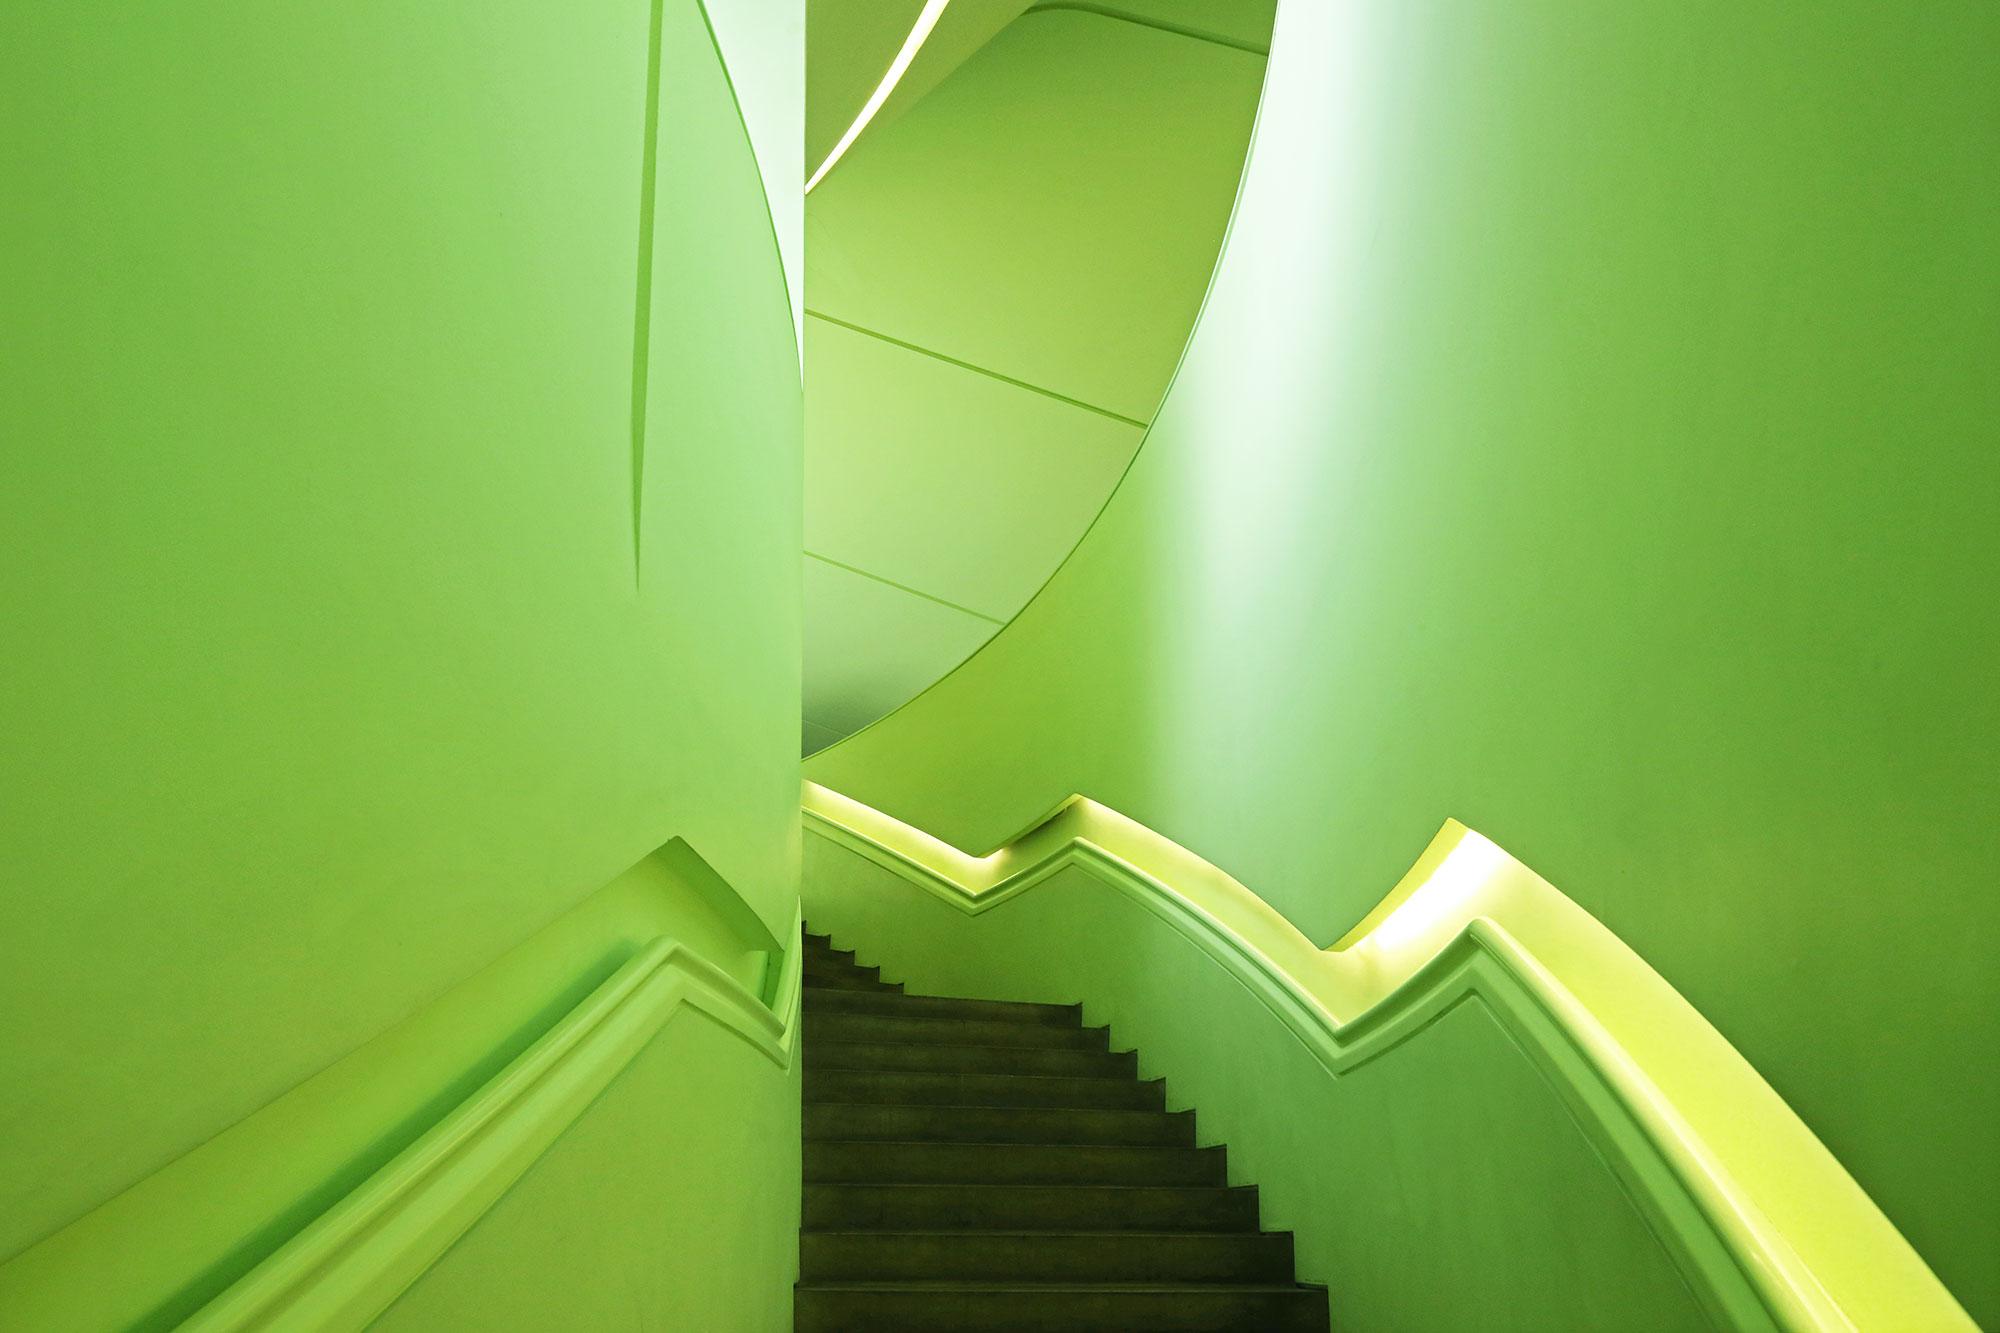 Riverside Museum, Glasgow (architect: Zaha Hadid)